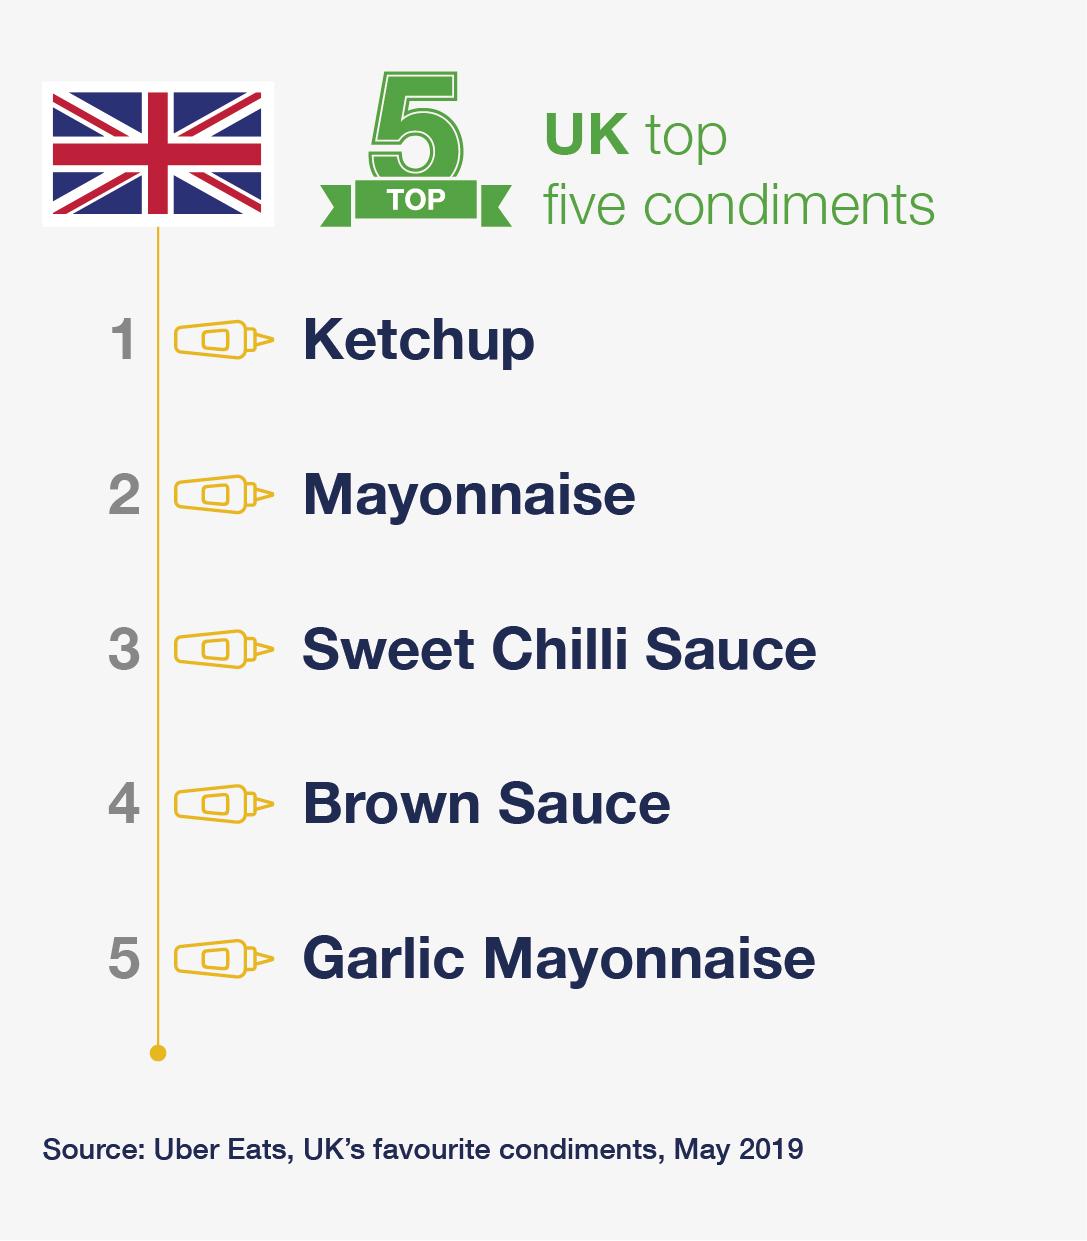 Top 5 UK Condiments